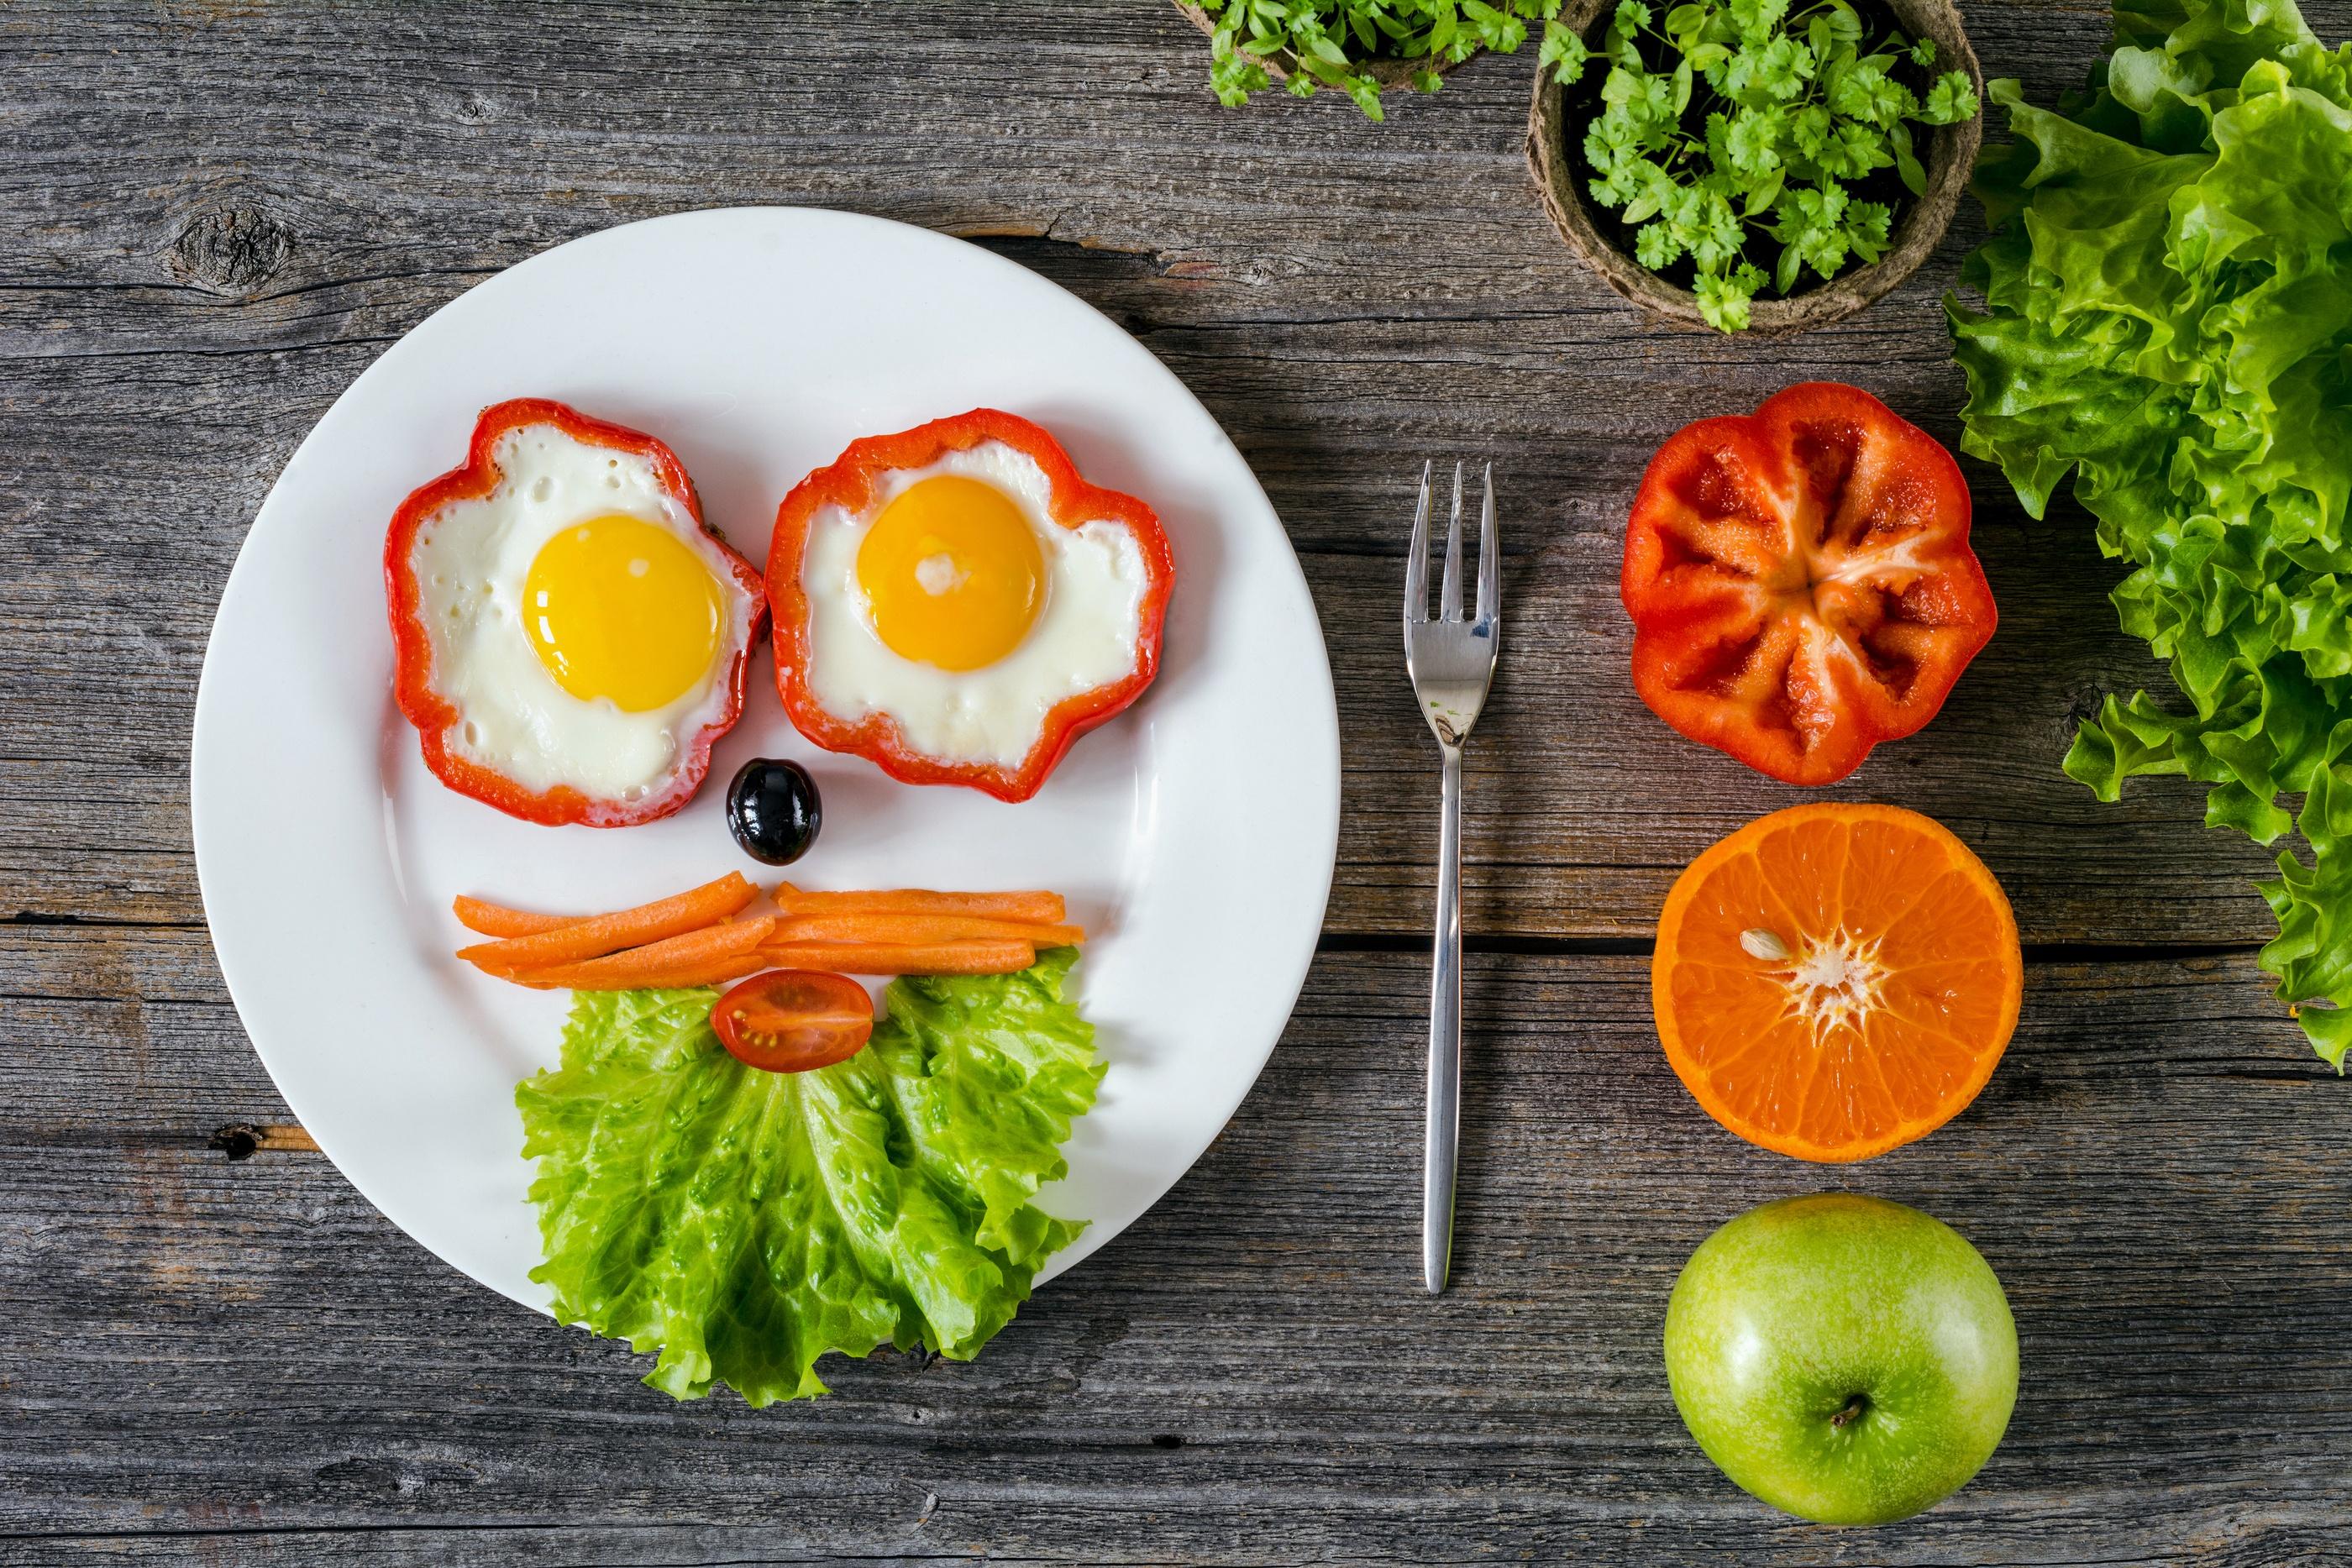 huevos-receta-vegetales-comidadivertida-bebes-seismeses.jpg